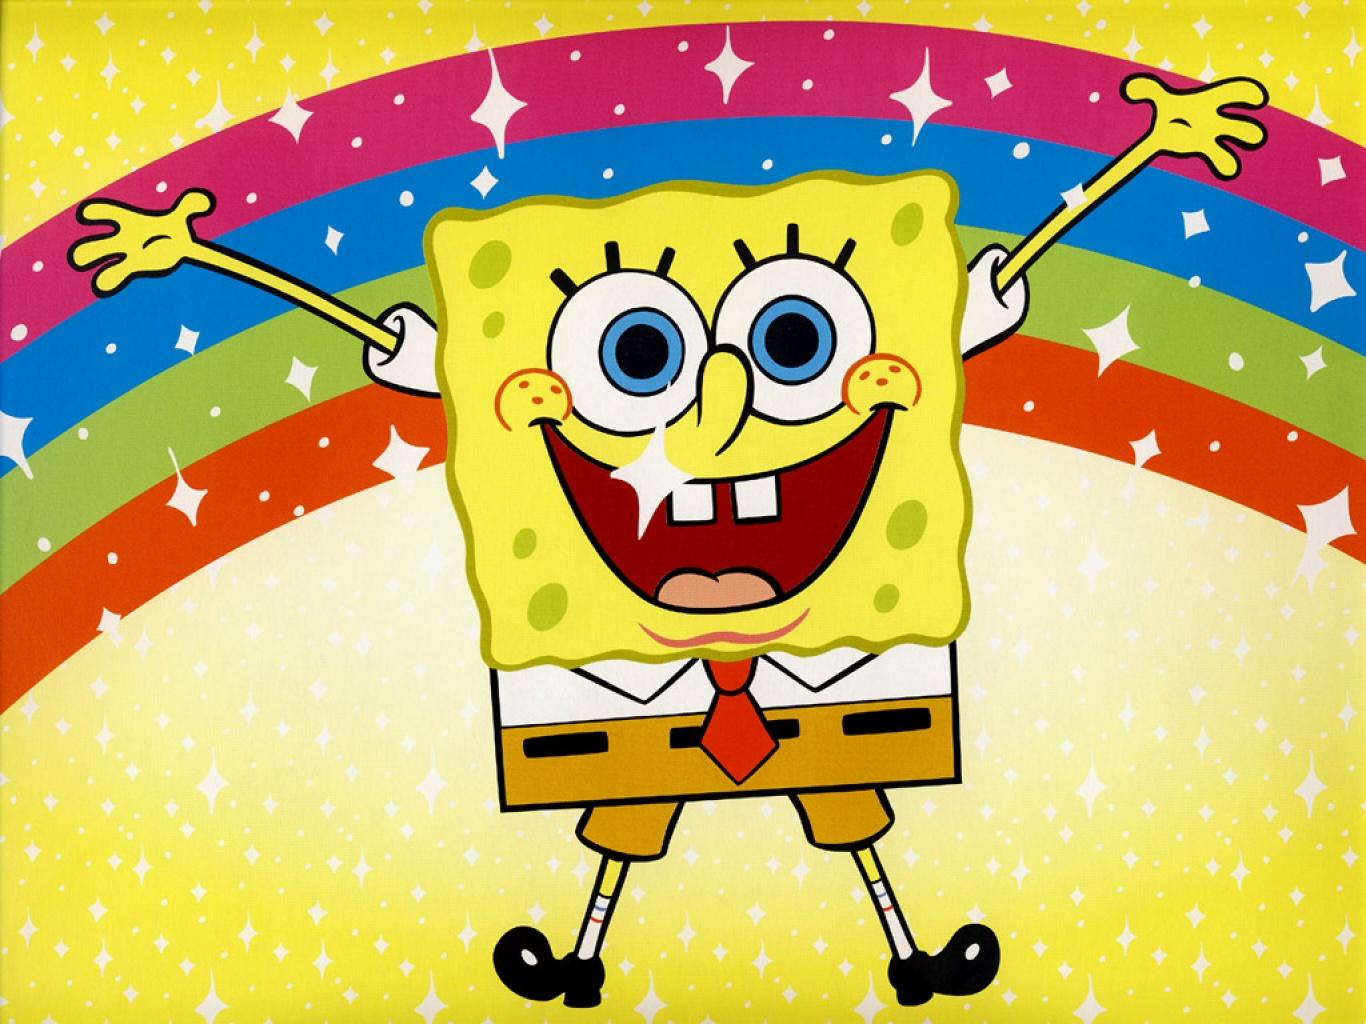 Nicolas Cage Background Rainbow Sponge bob with rainbow